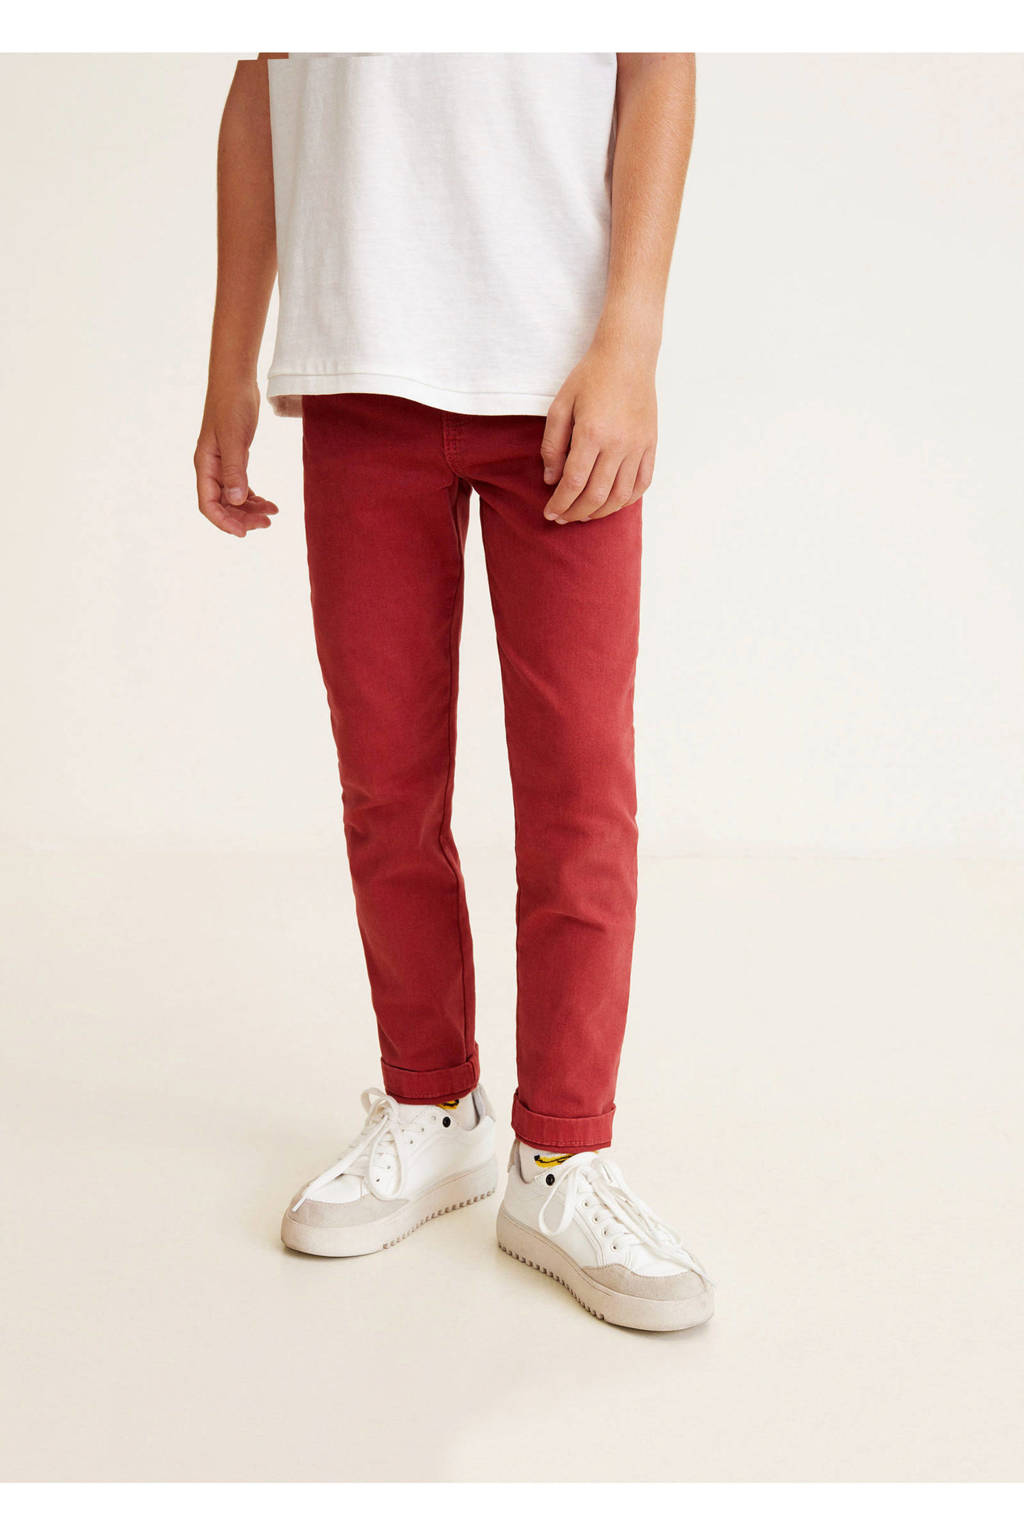 Mango Kids slim fit broek rood, Rood